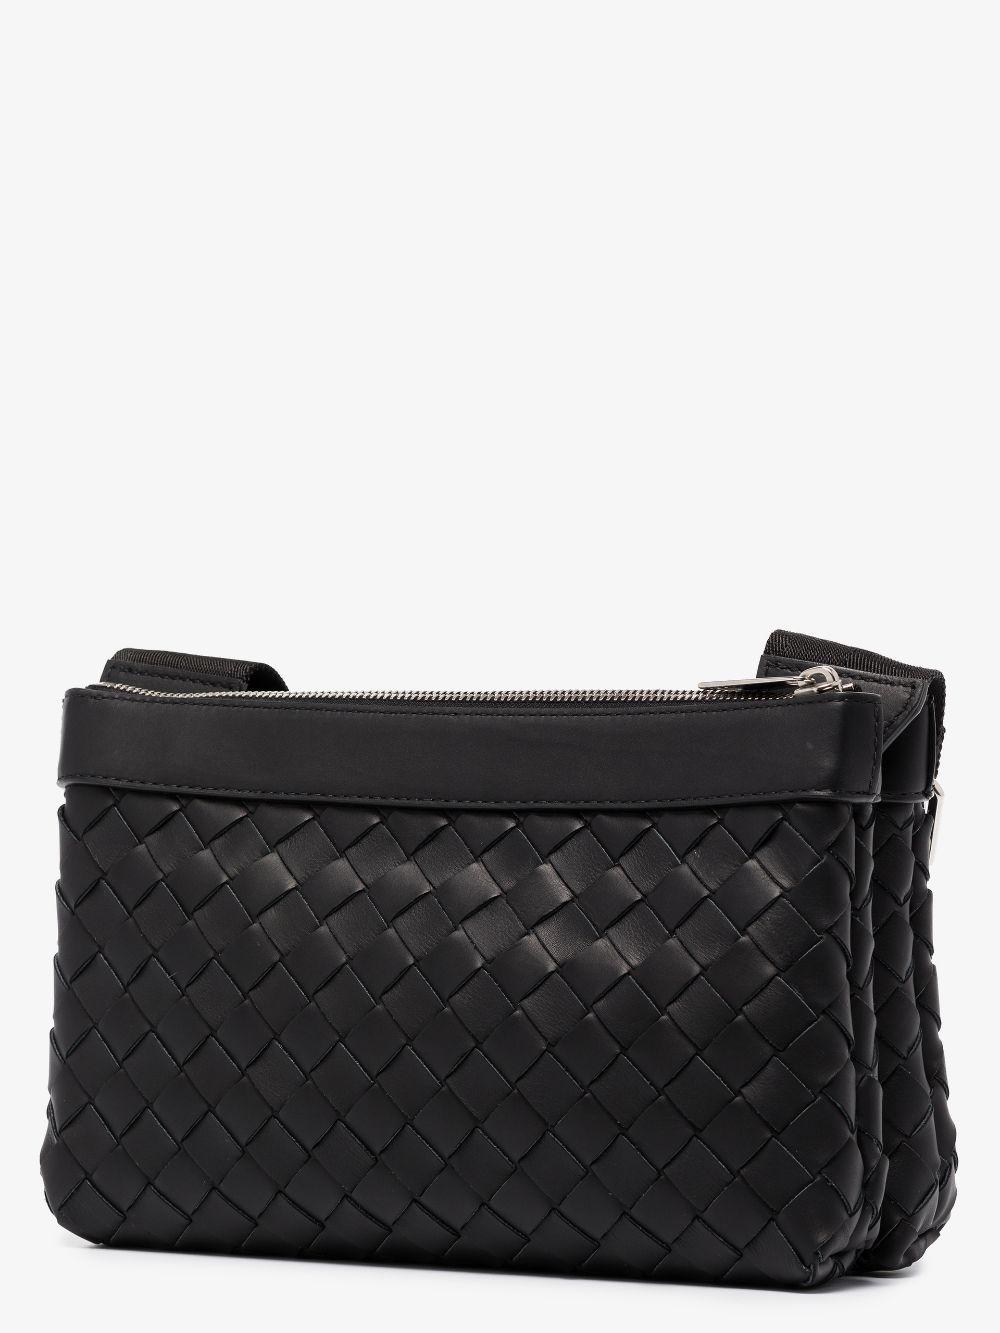 Picture of Bottega Veneta | Intrecciato Leather Messenger Bag